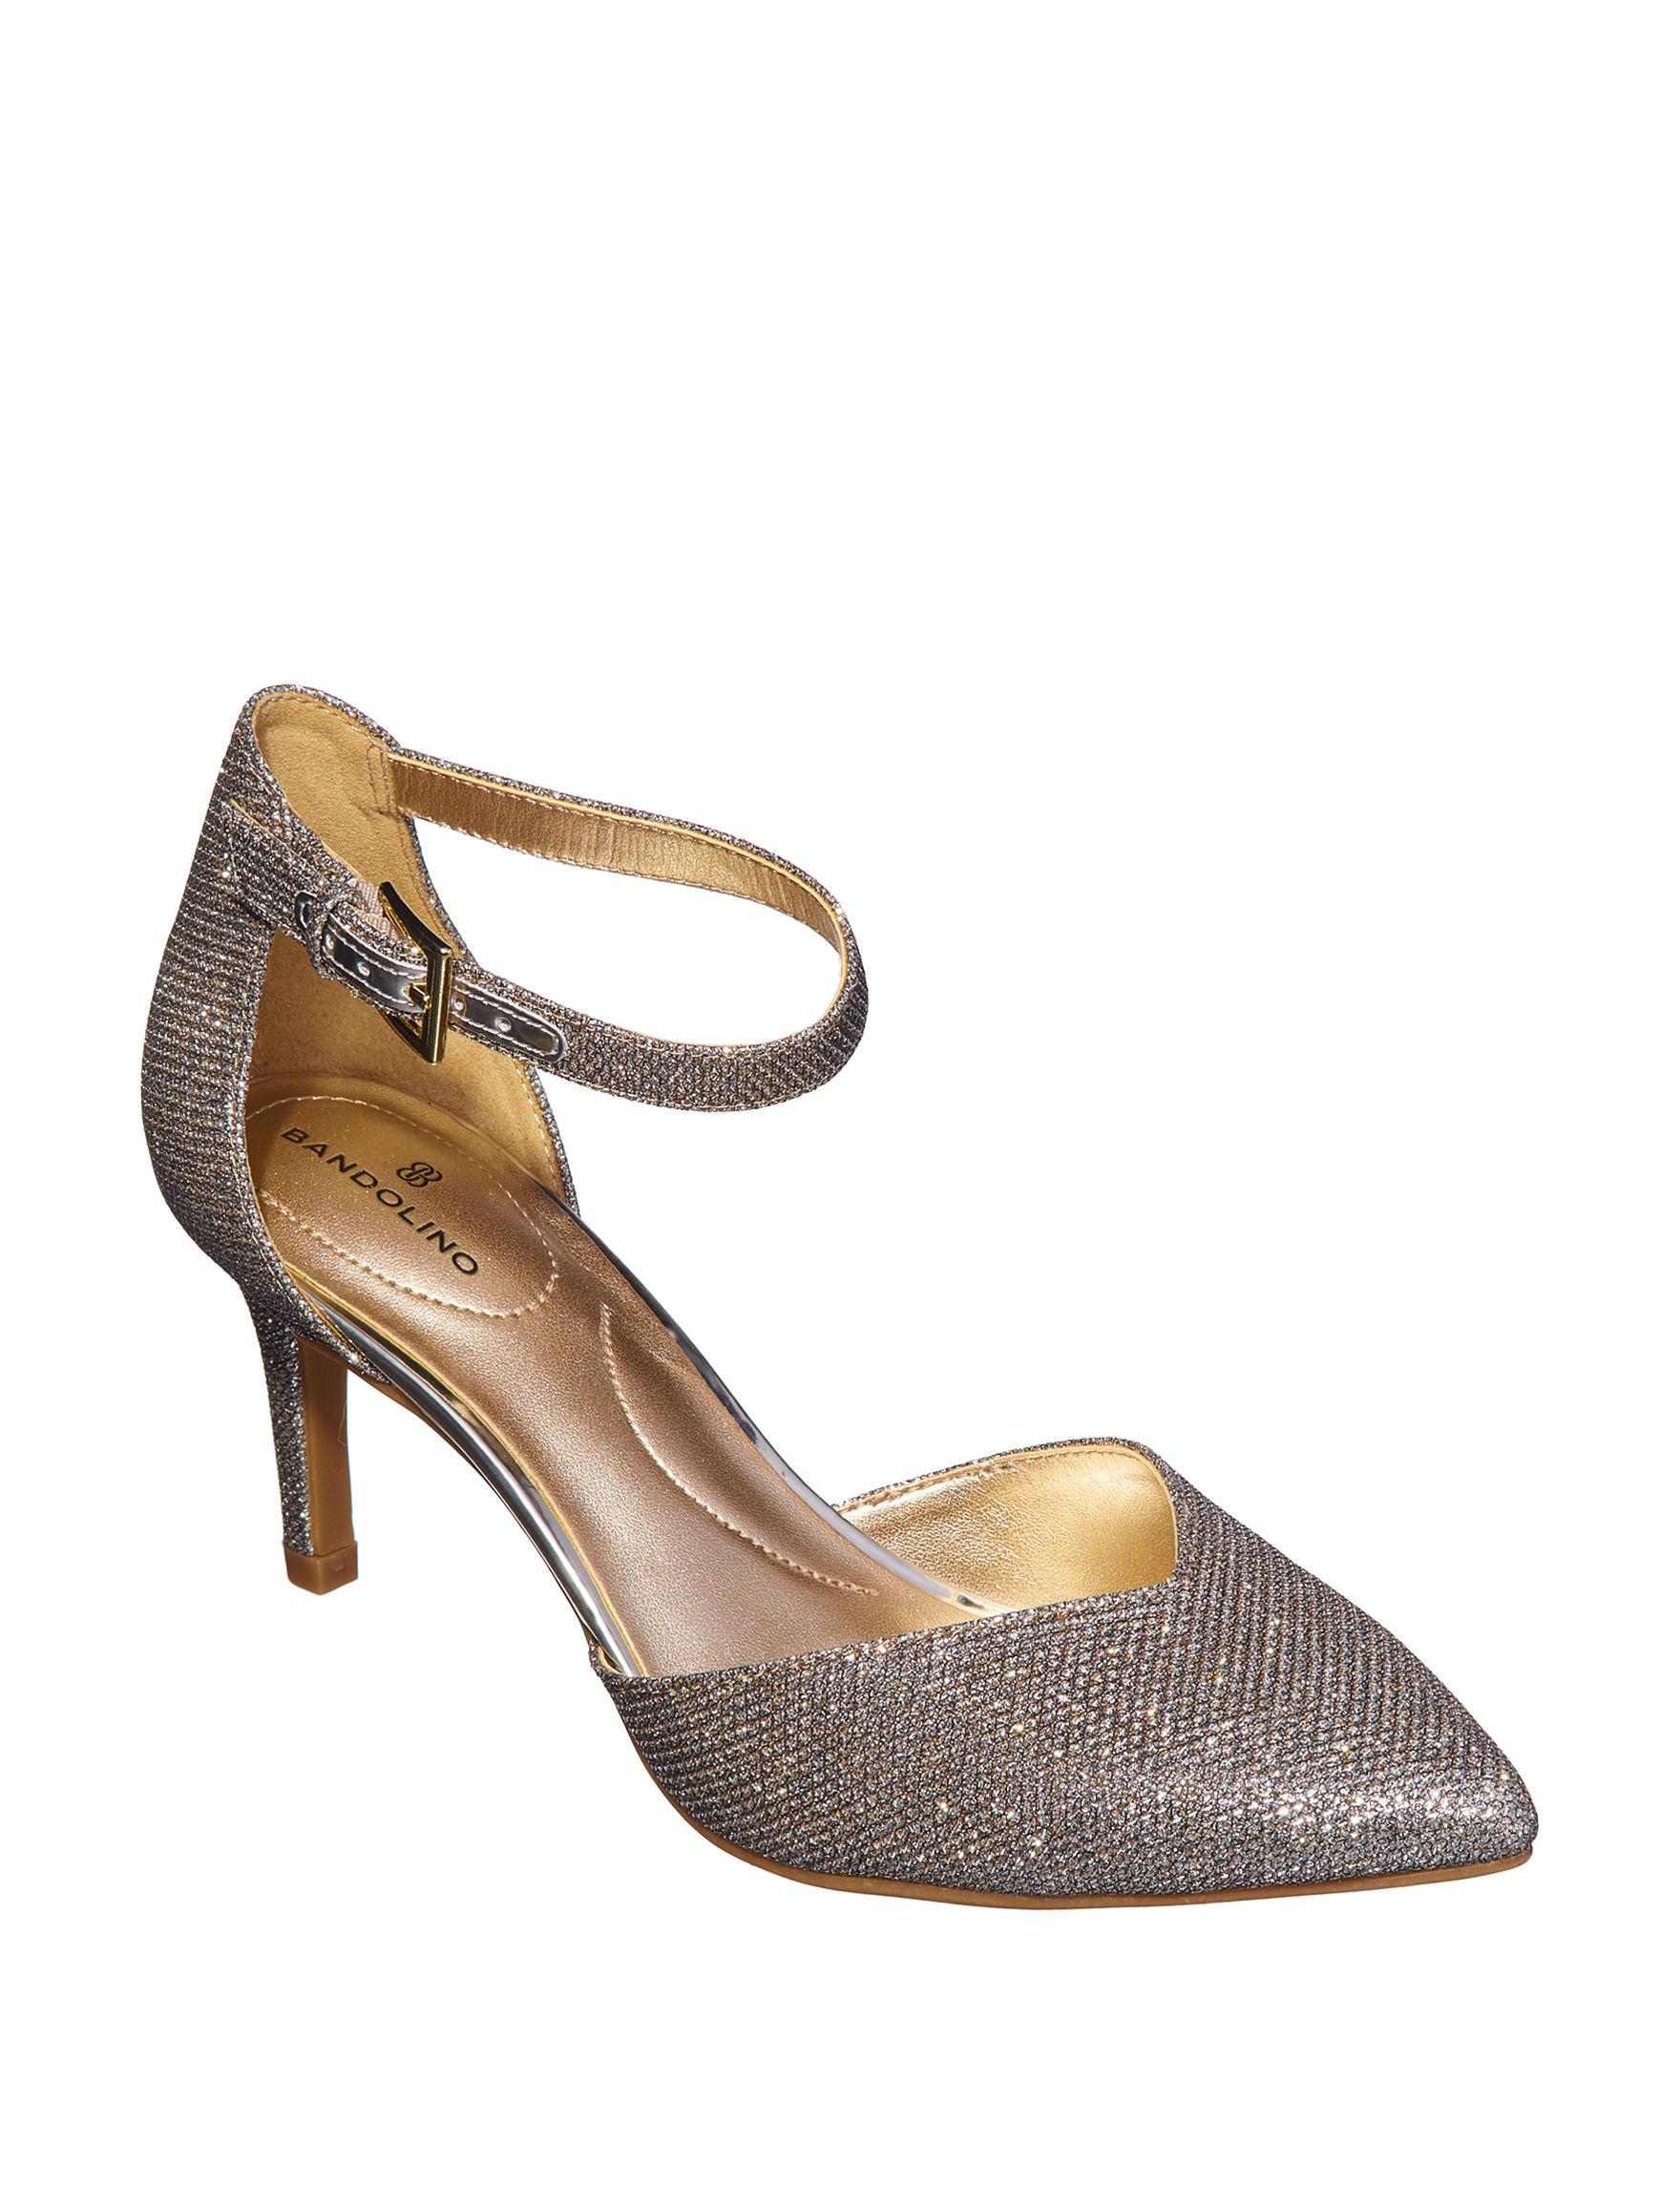 Bandolino Gold Comfort Shoes